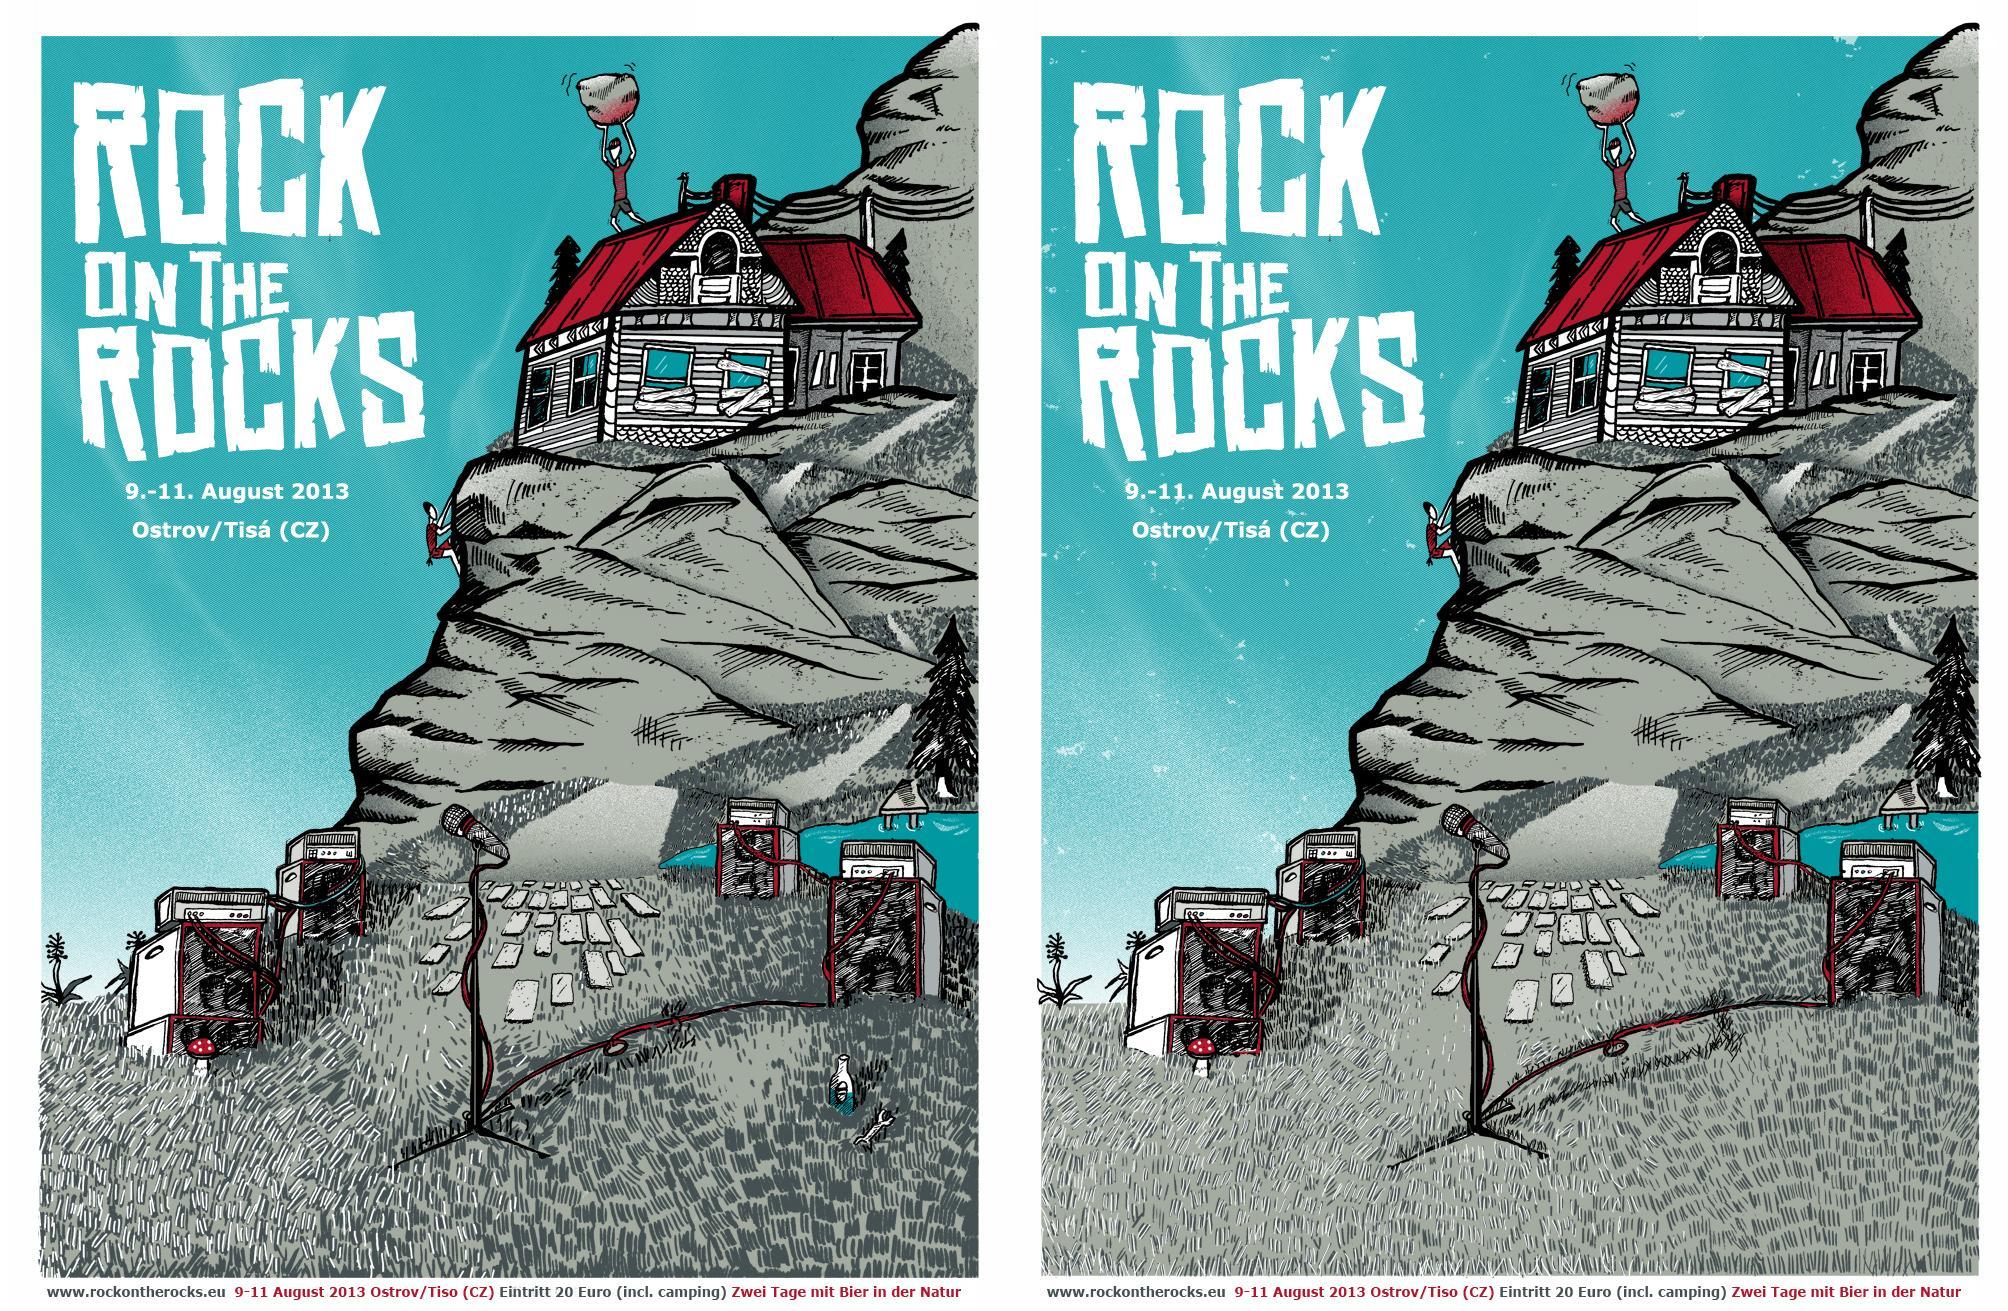 3/23 Silk scrren print: Rock on the Rocks Festival - image 14 - student project